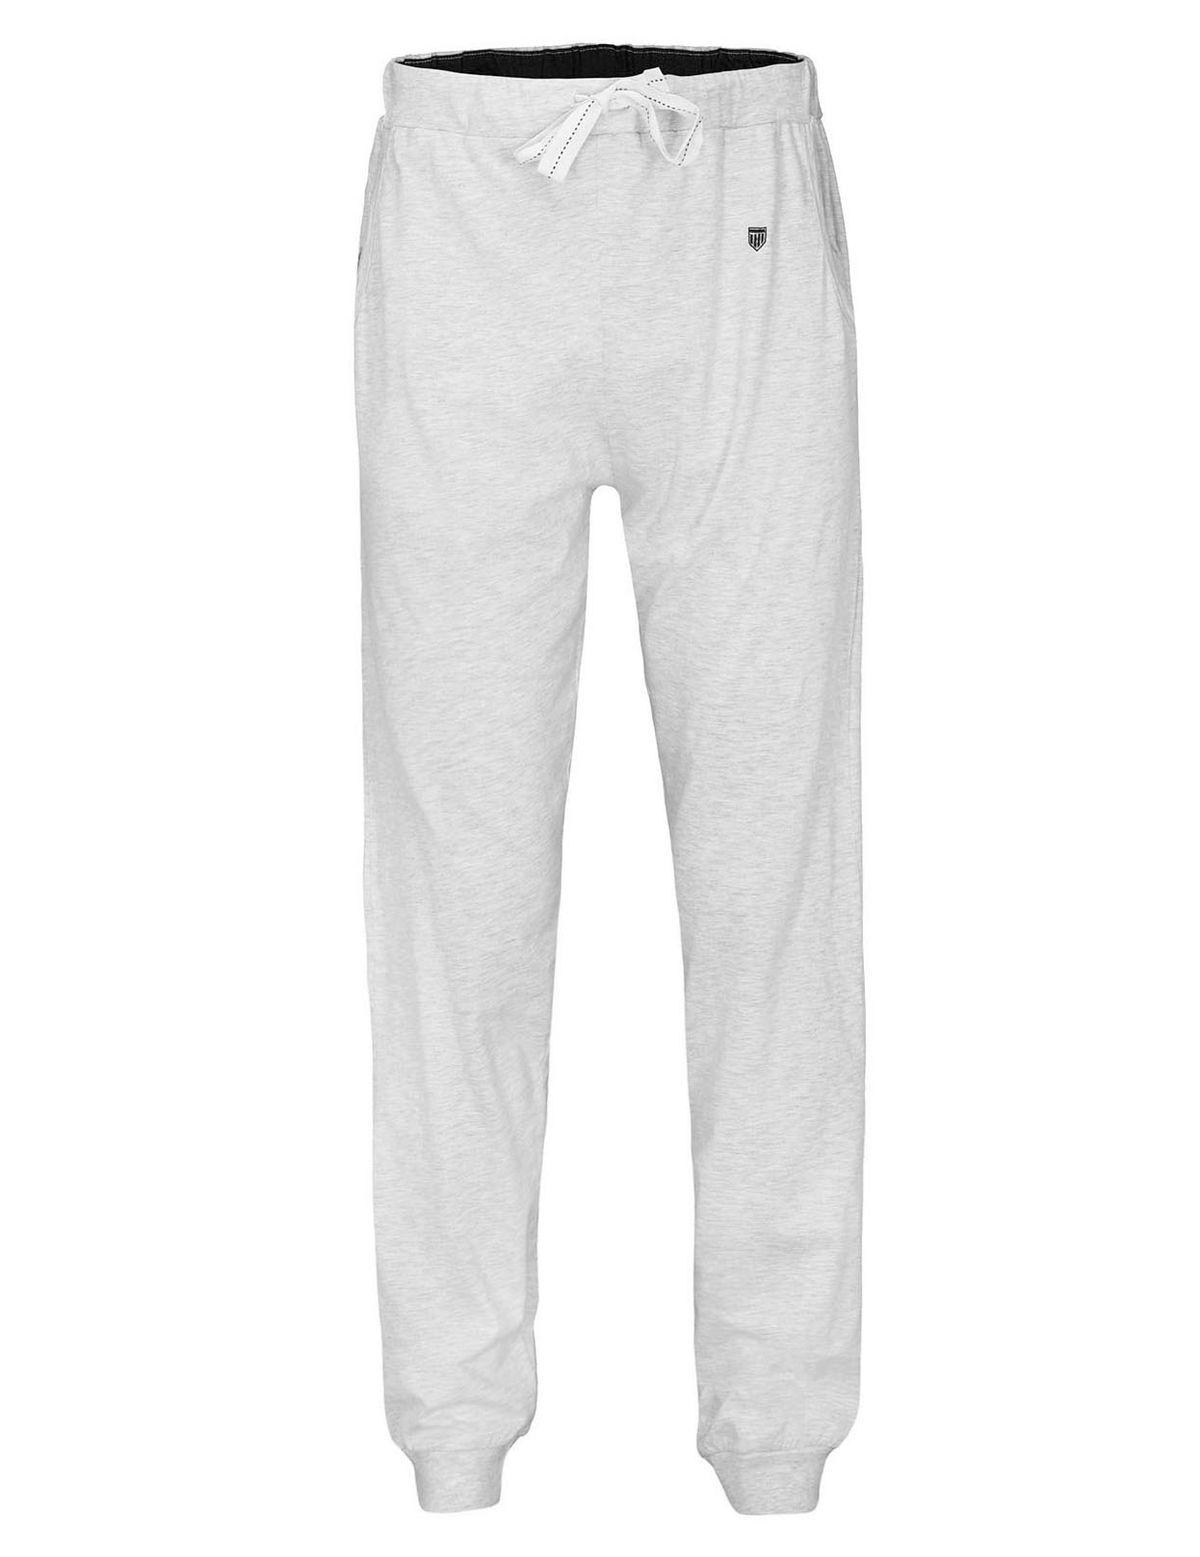 HOMEWEAR Pyjama Hose lang mit Tunnelzug - Grey Melange